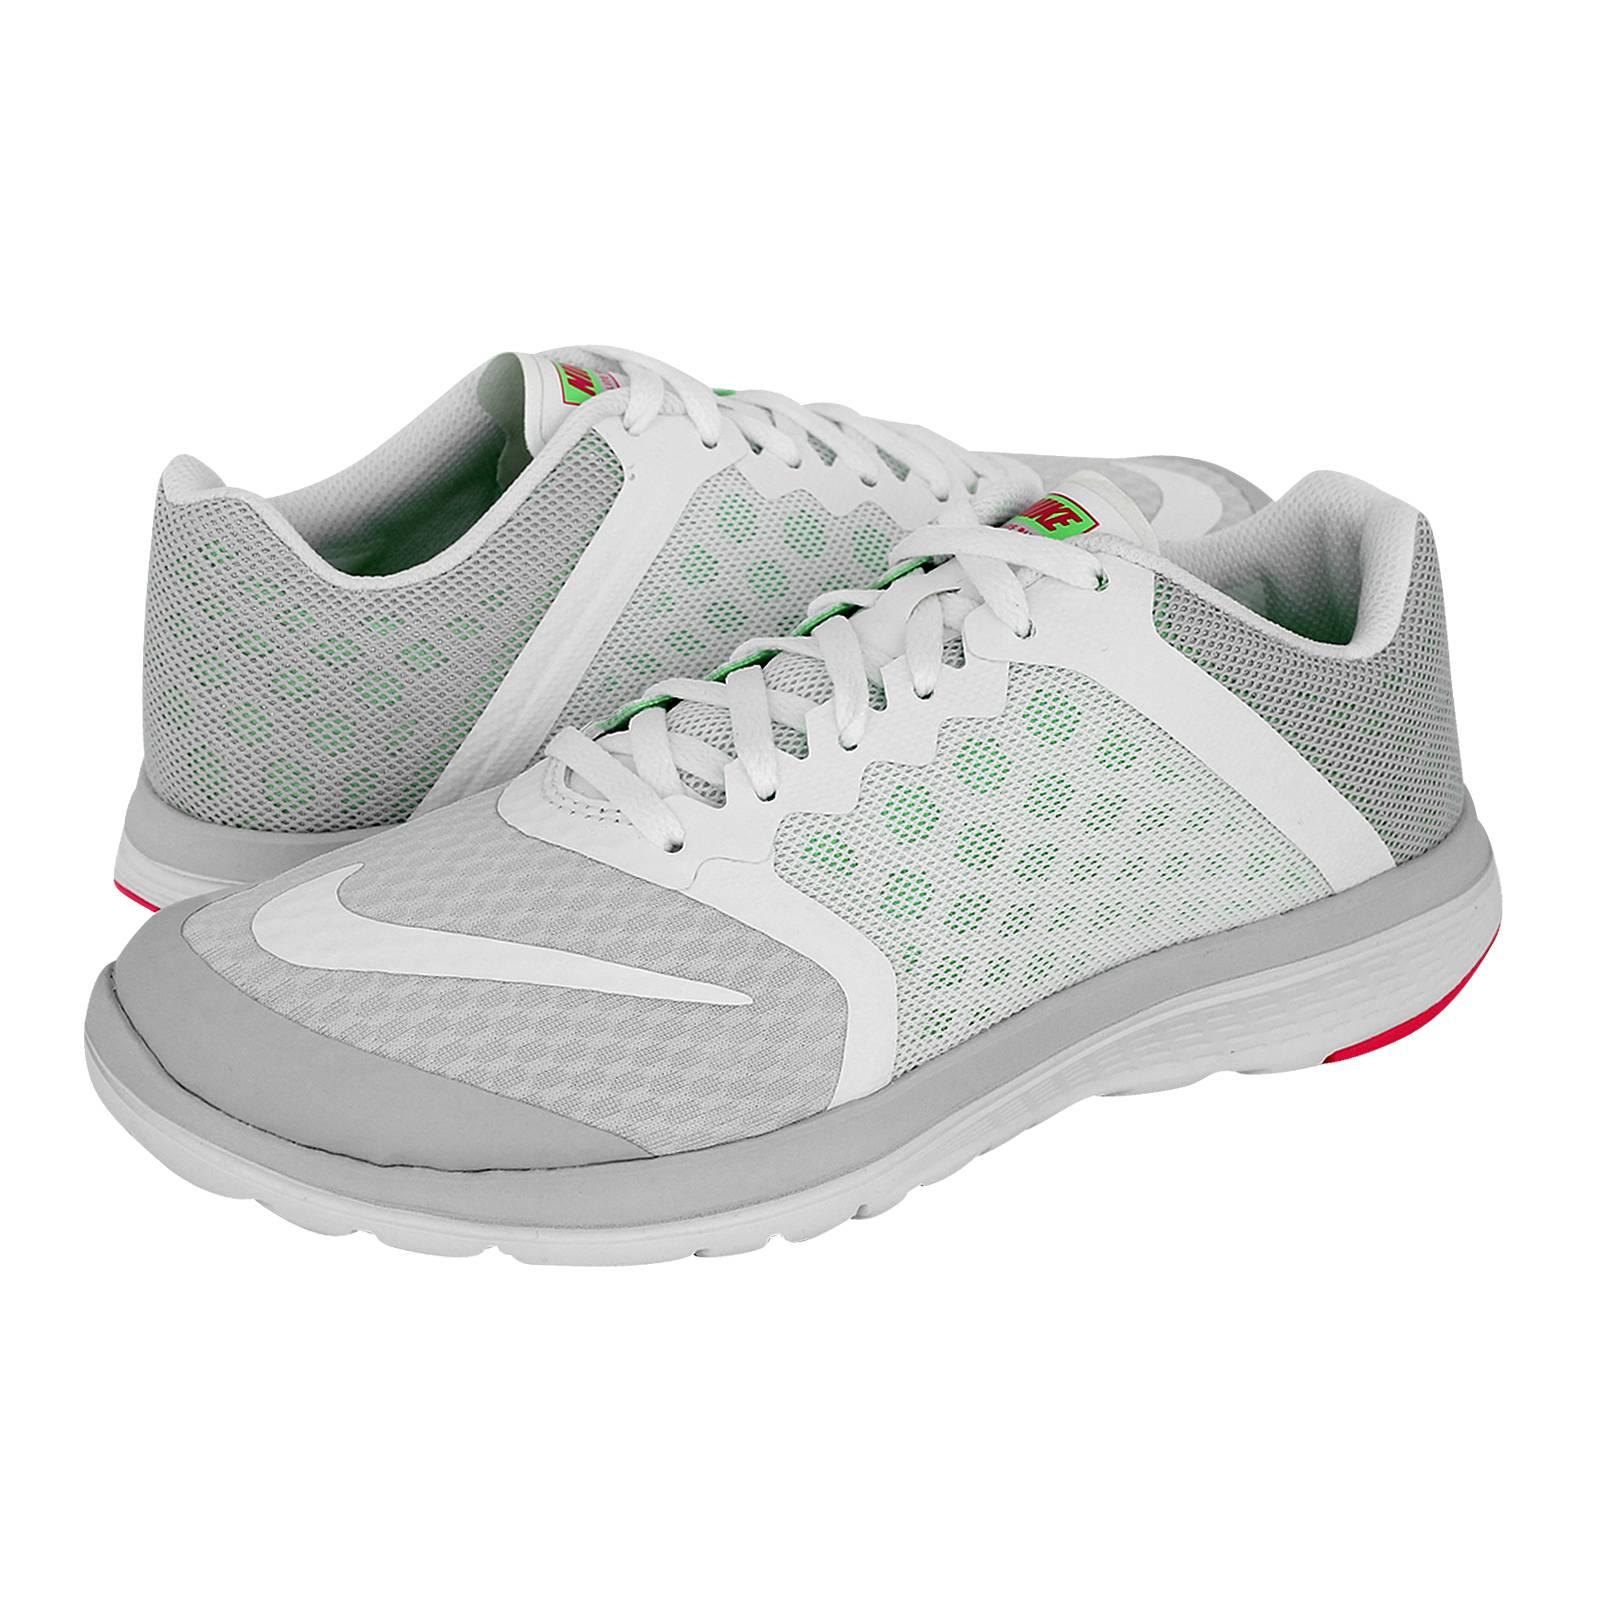 FS Lite Run 3 - Nike Women's athletic